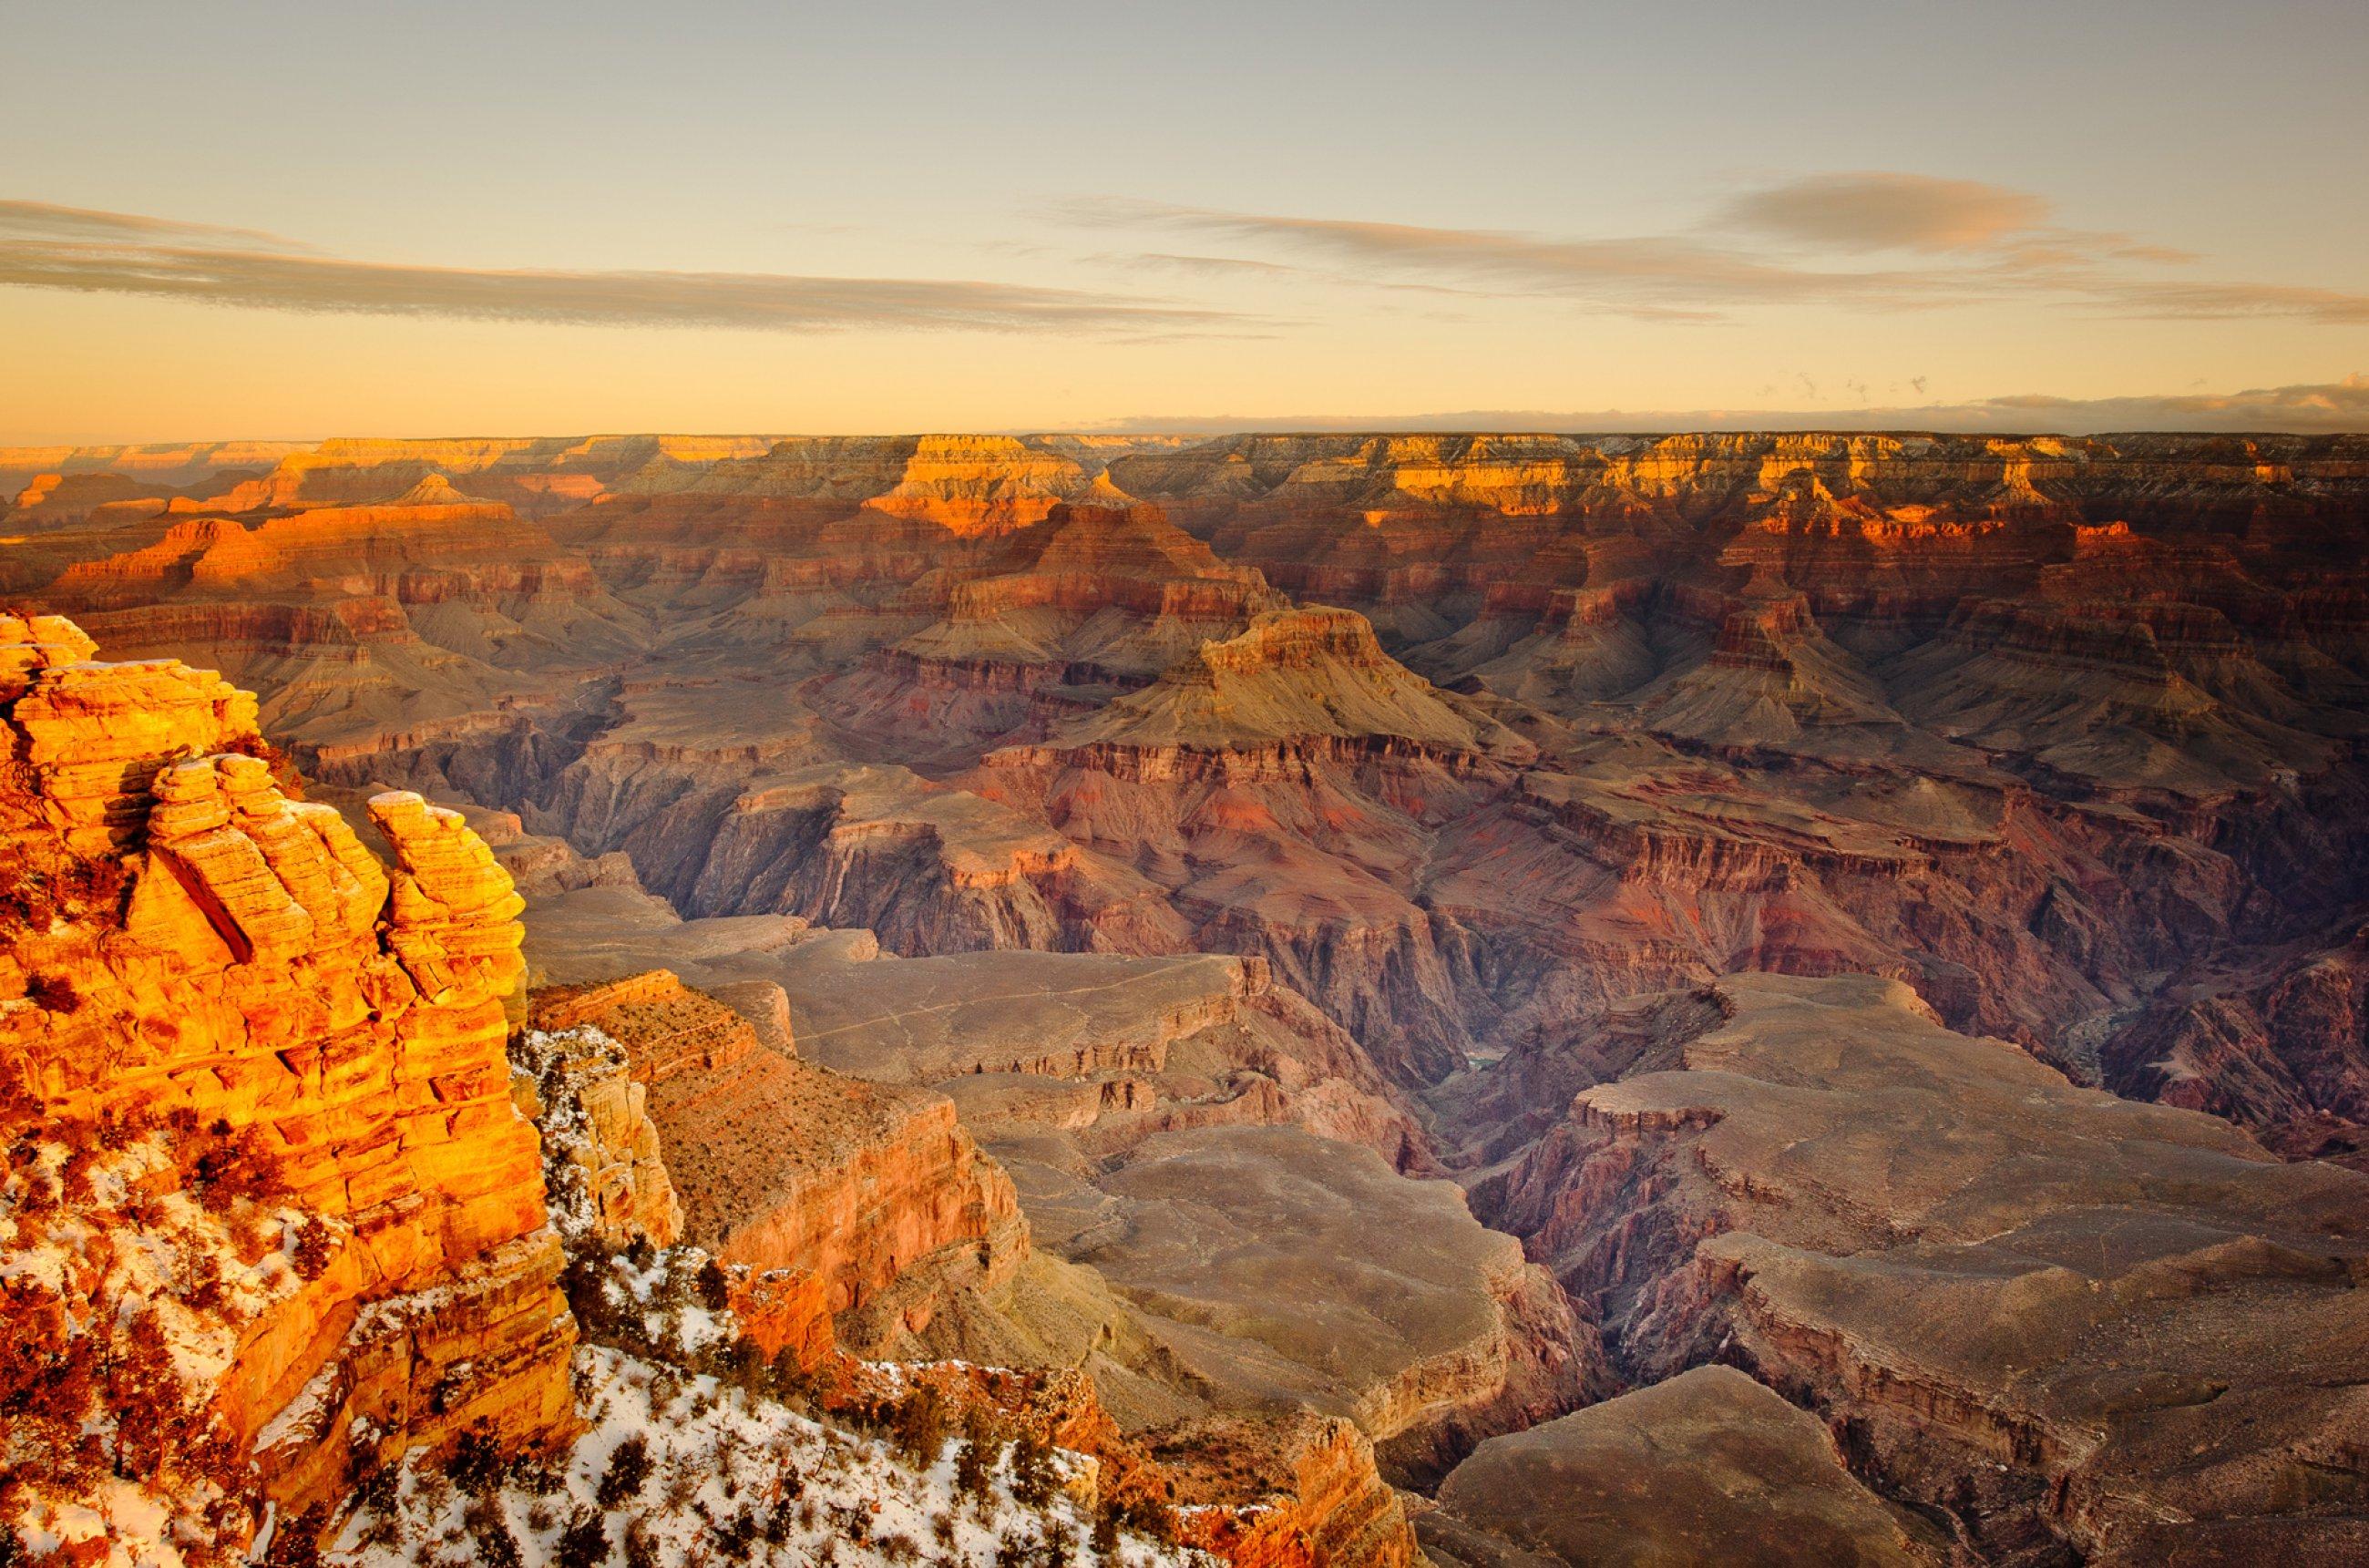 https://bubo.sk/uploads/galleries/4996/grand-canyon-shutterstock-236202247-2-.jpg